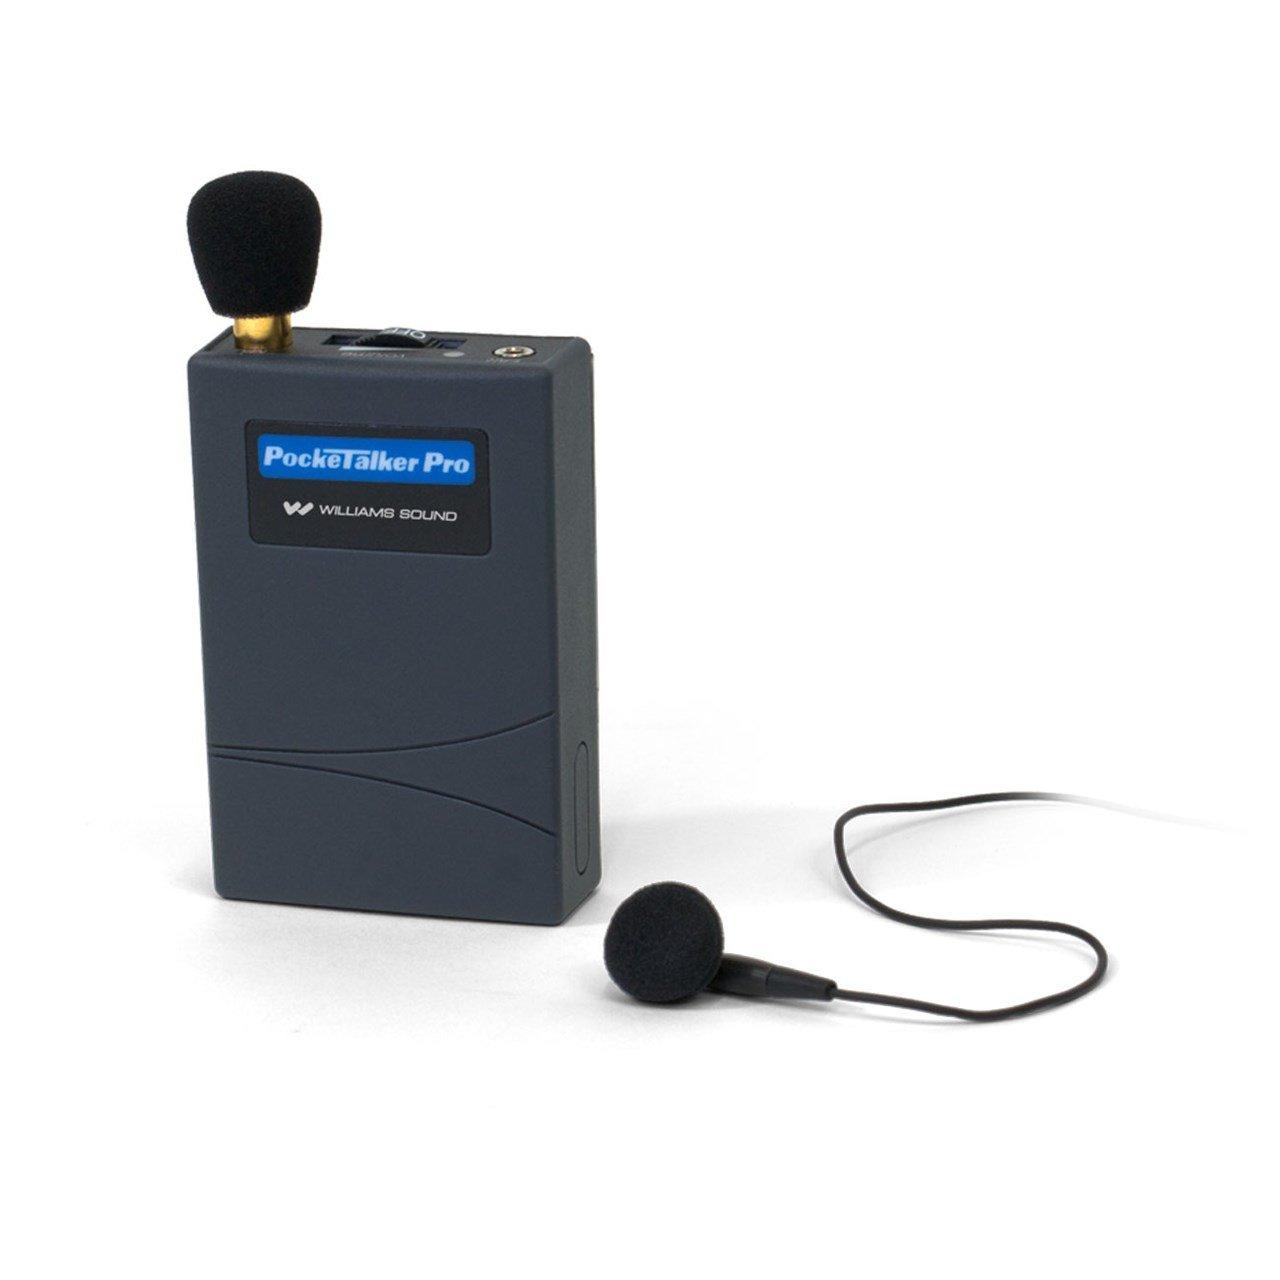 Pocketalker Pro with Mini EarBud